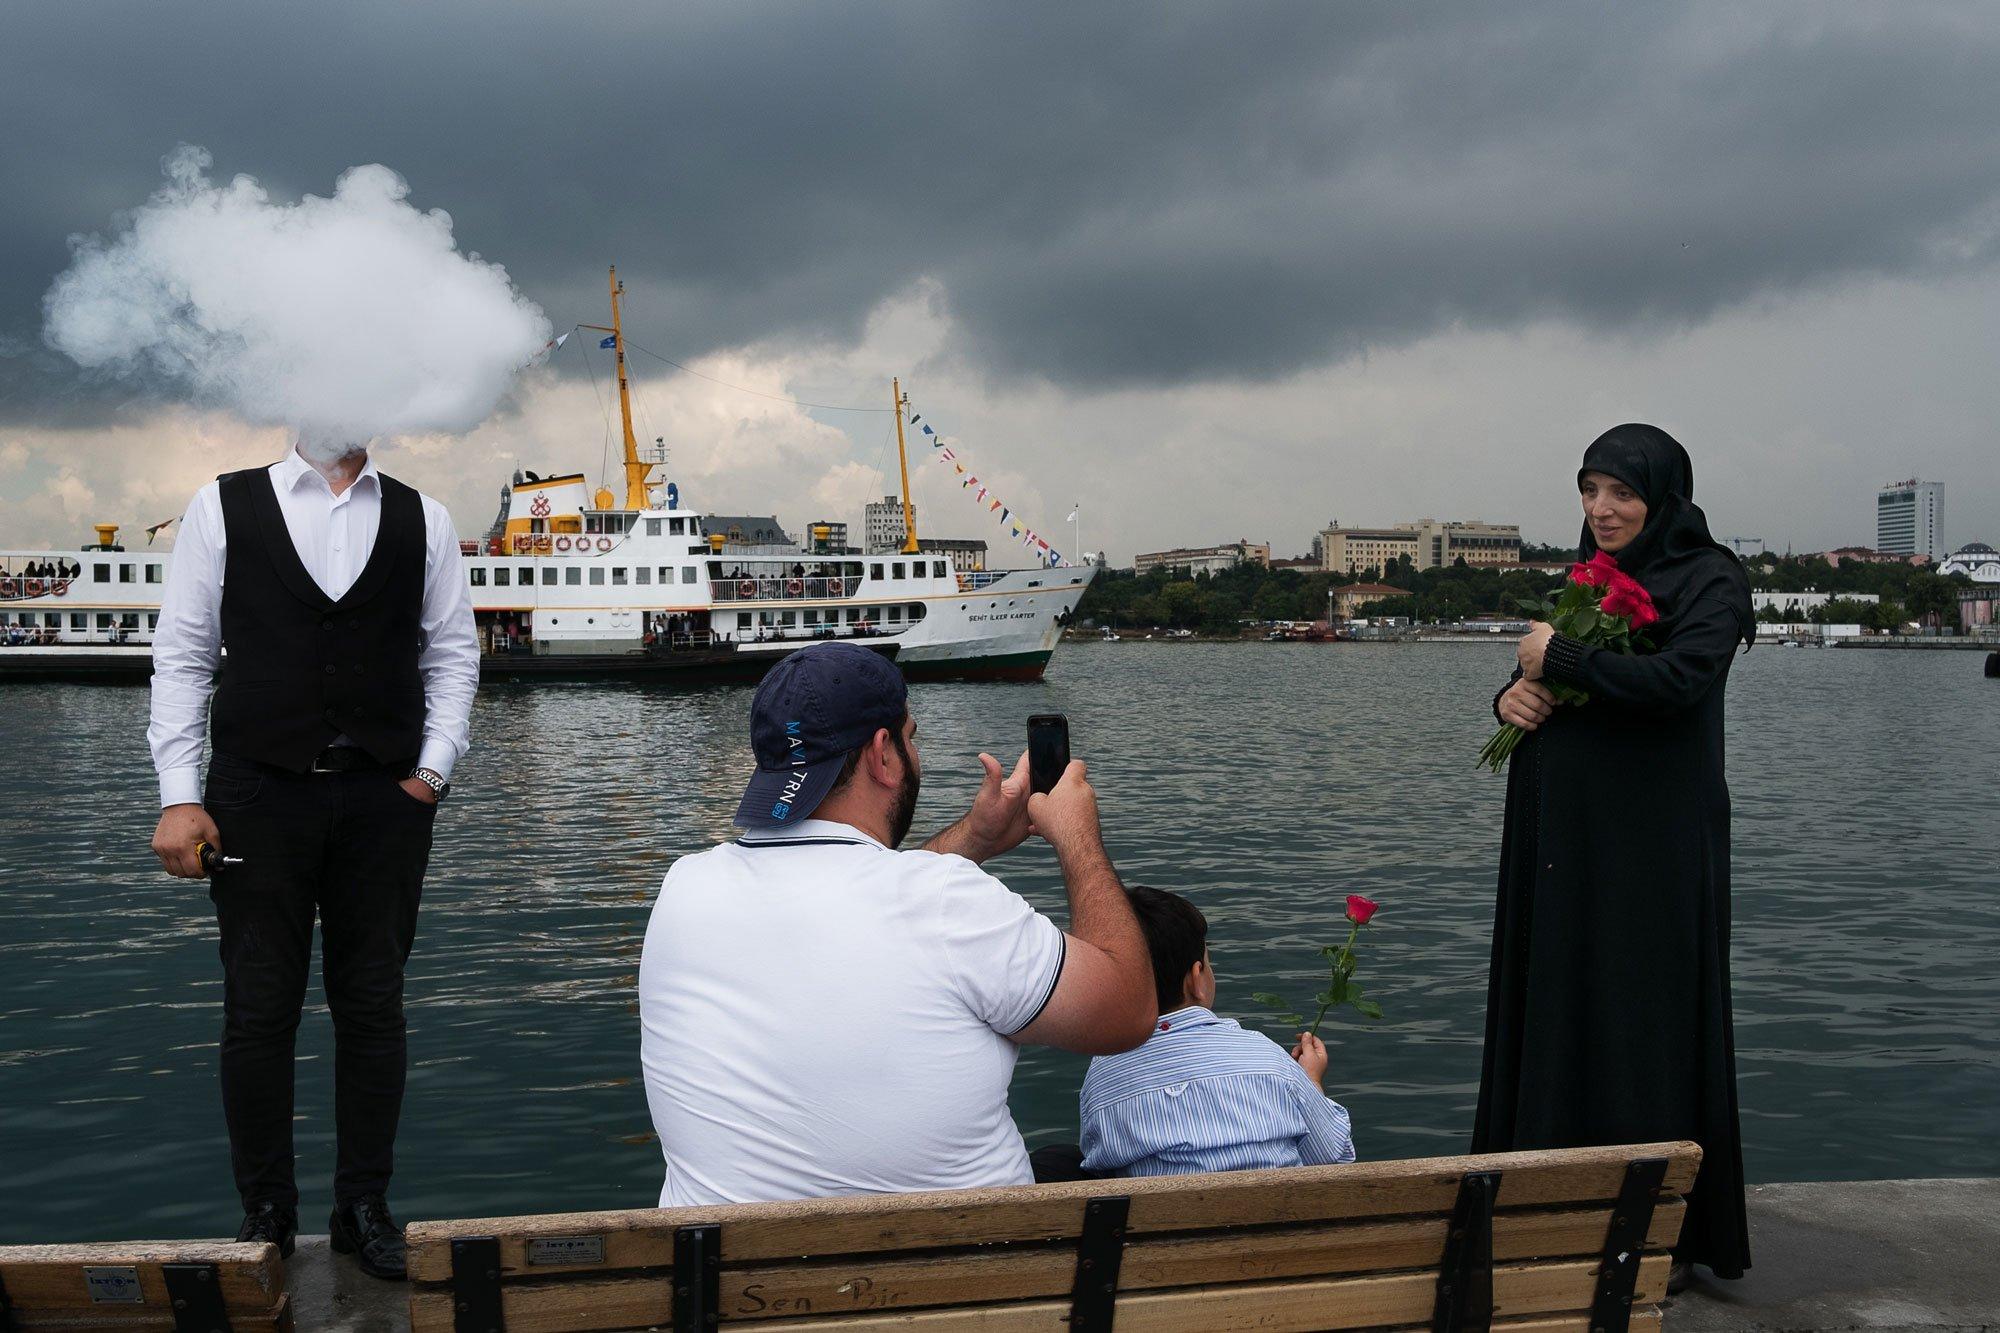 Street photography in Turchia dal fotografo Haluk Safi